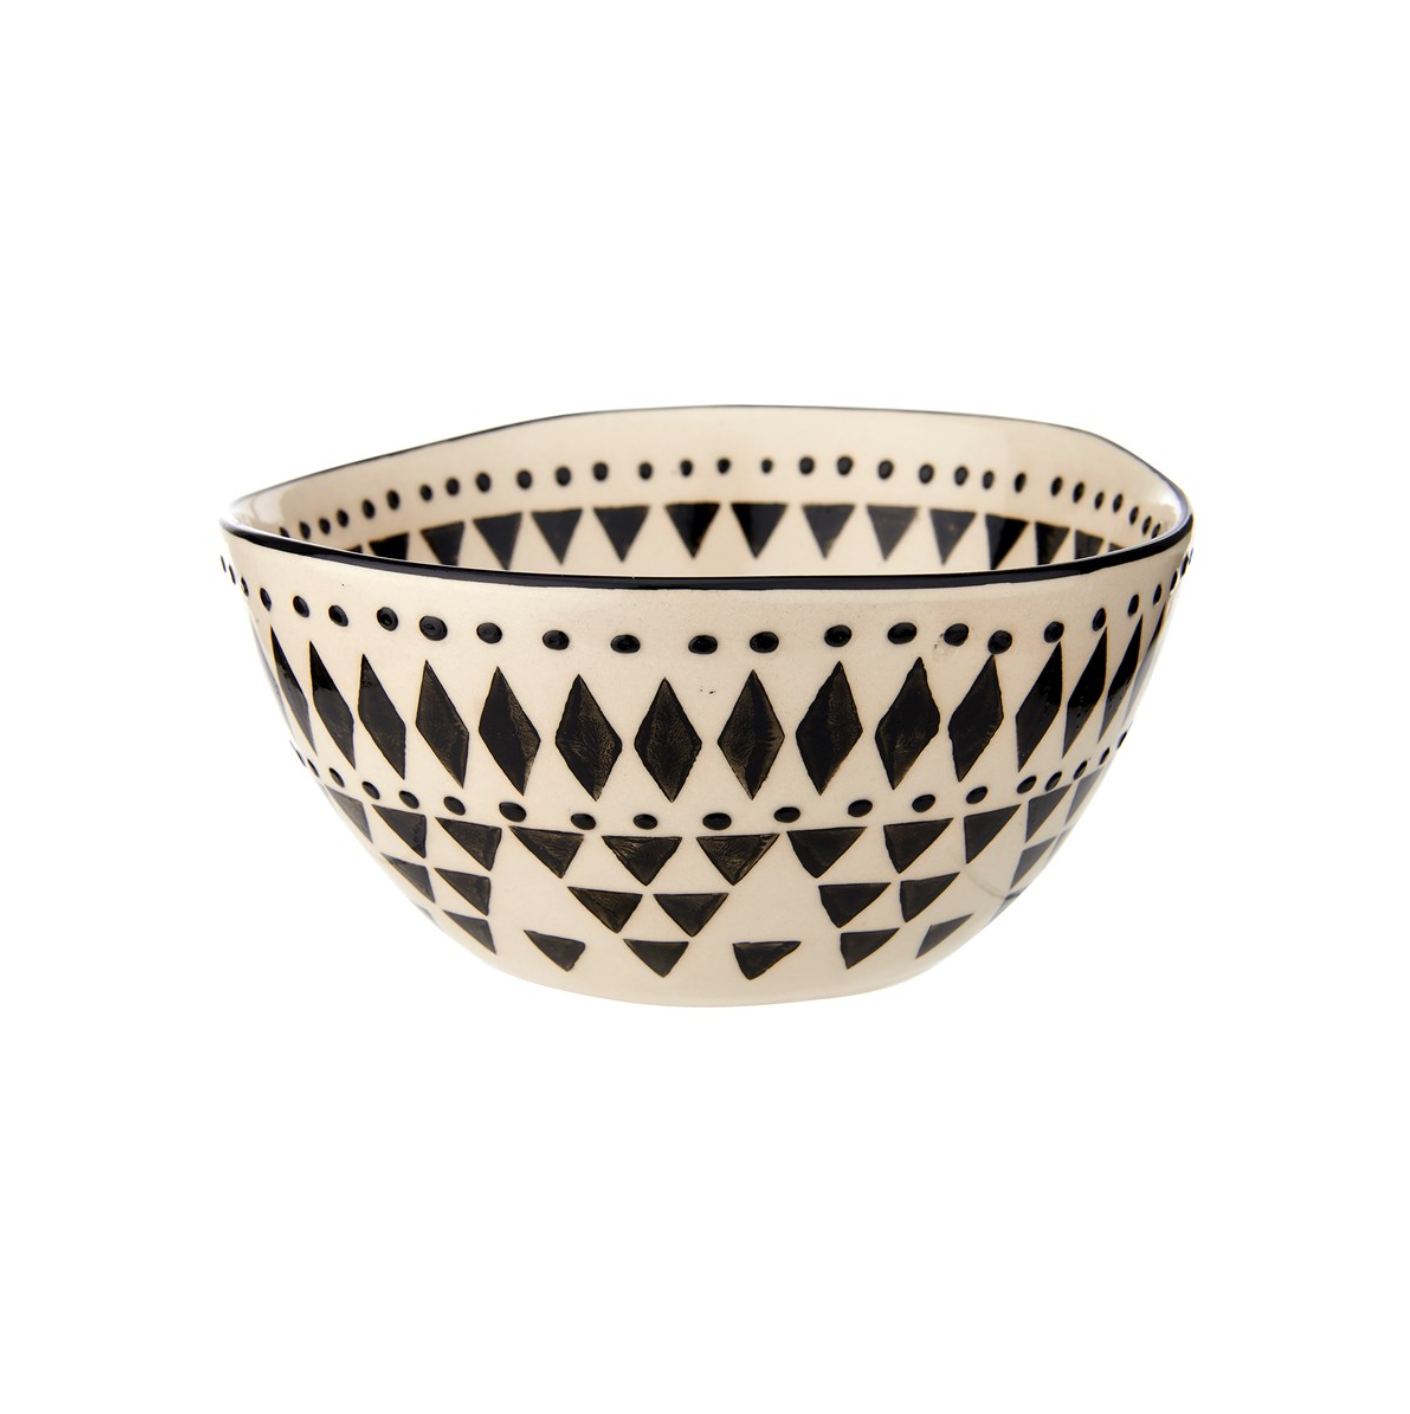 Scandi Boho Wobbly Bowl